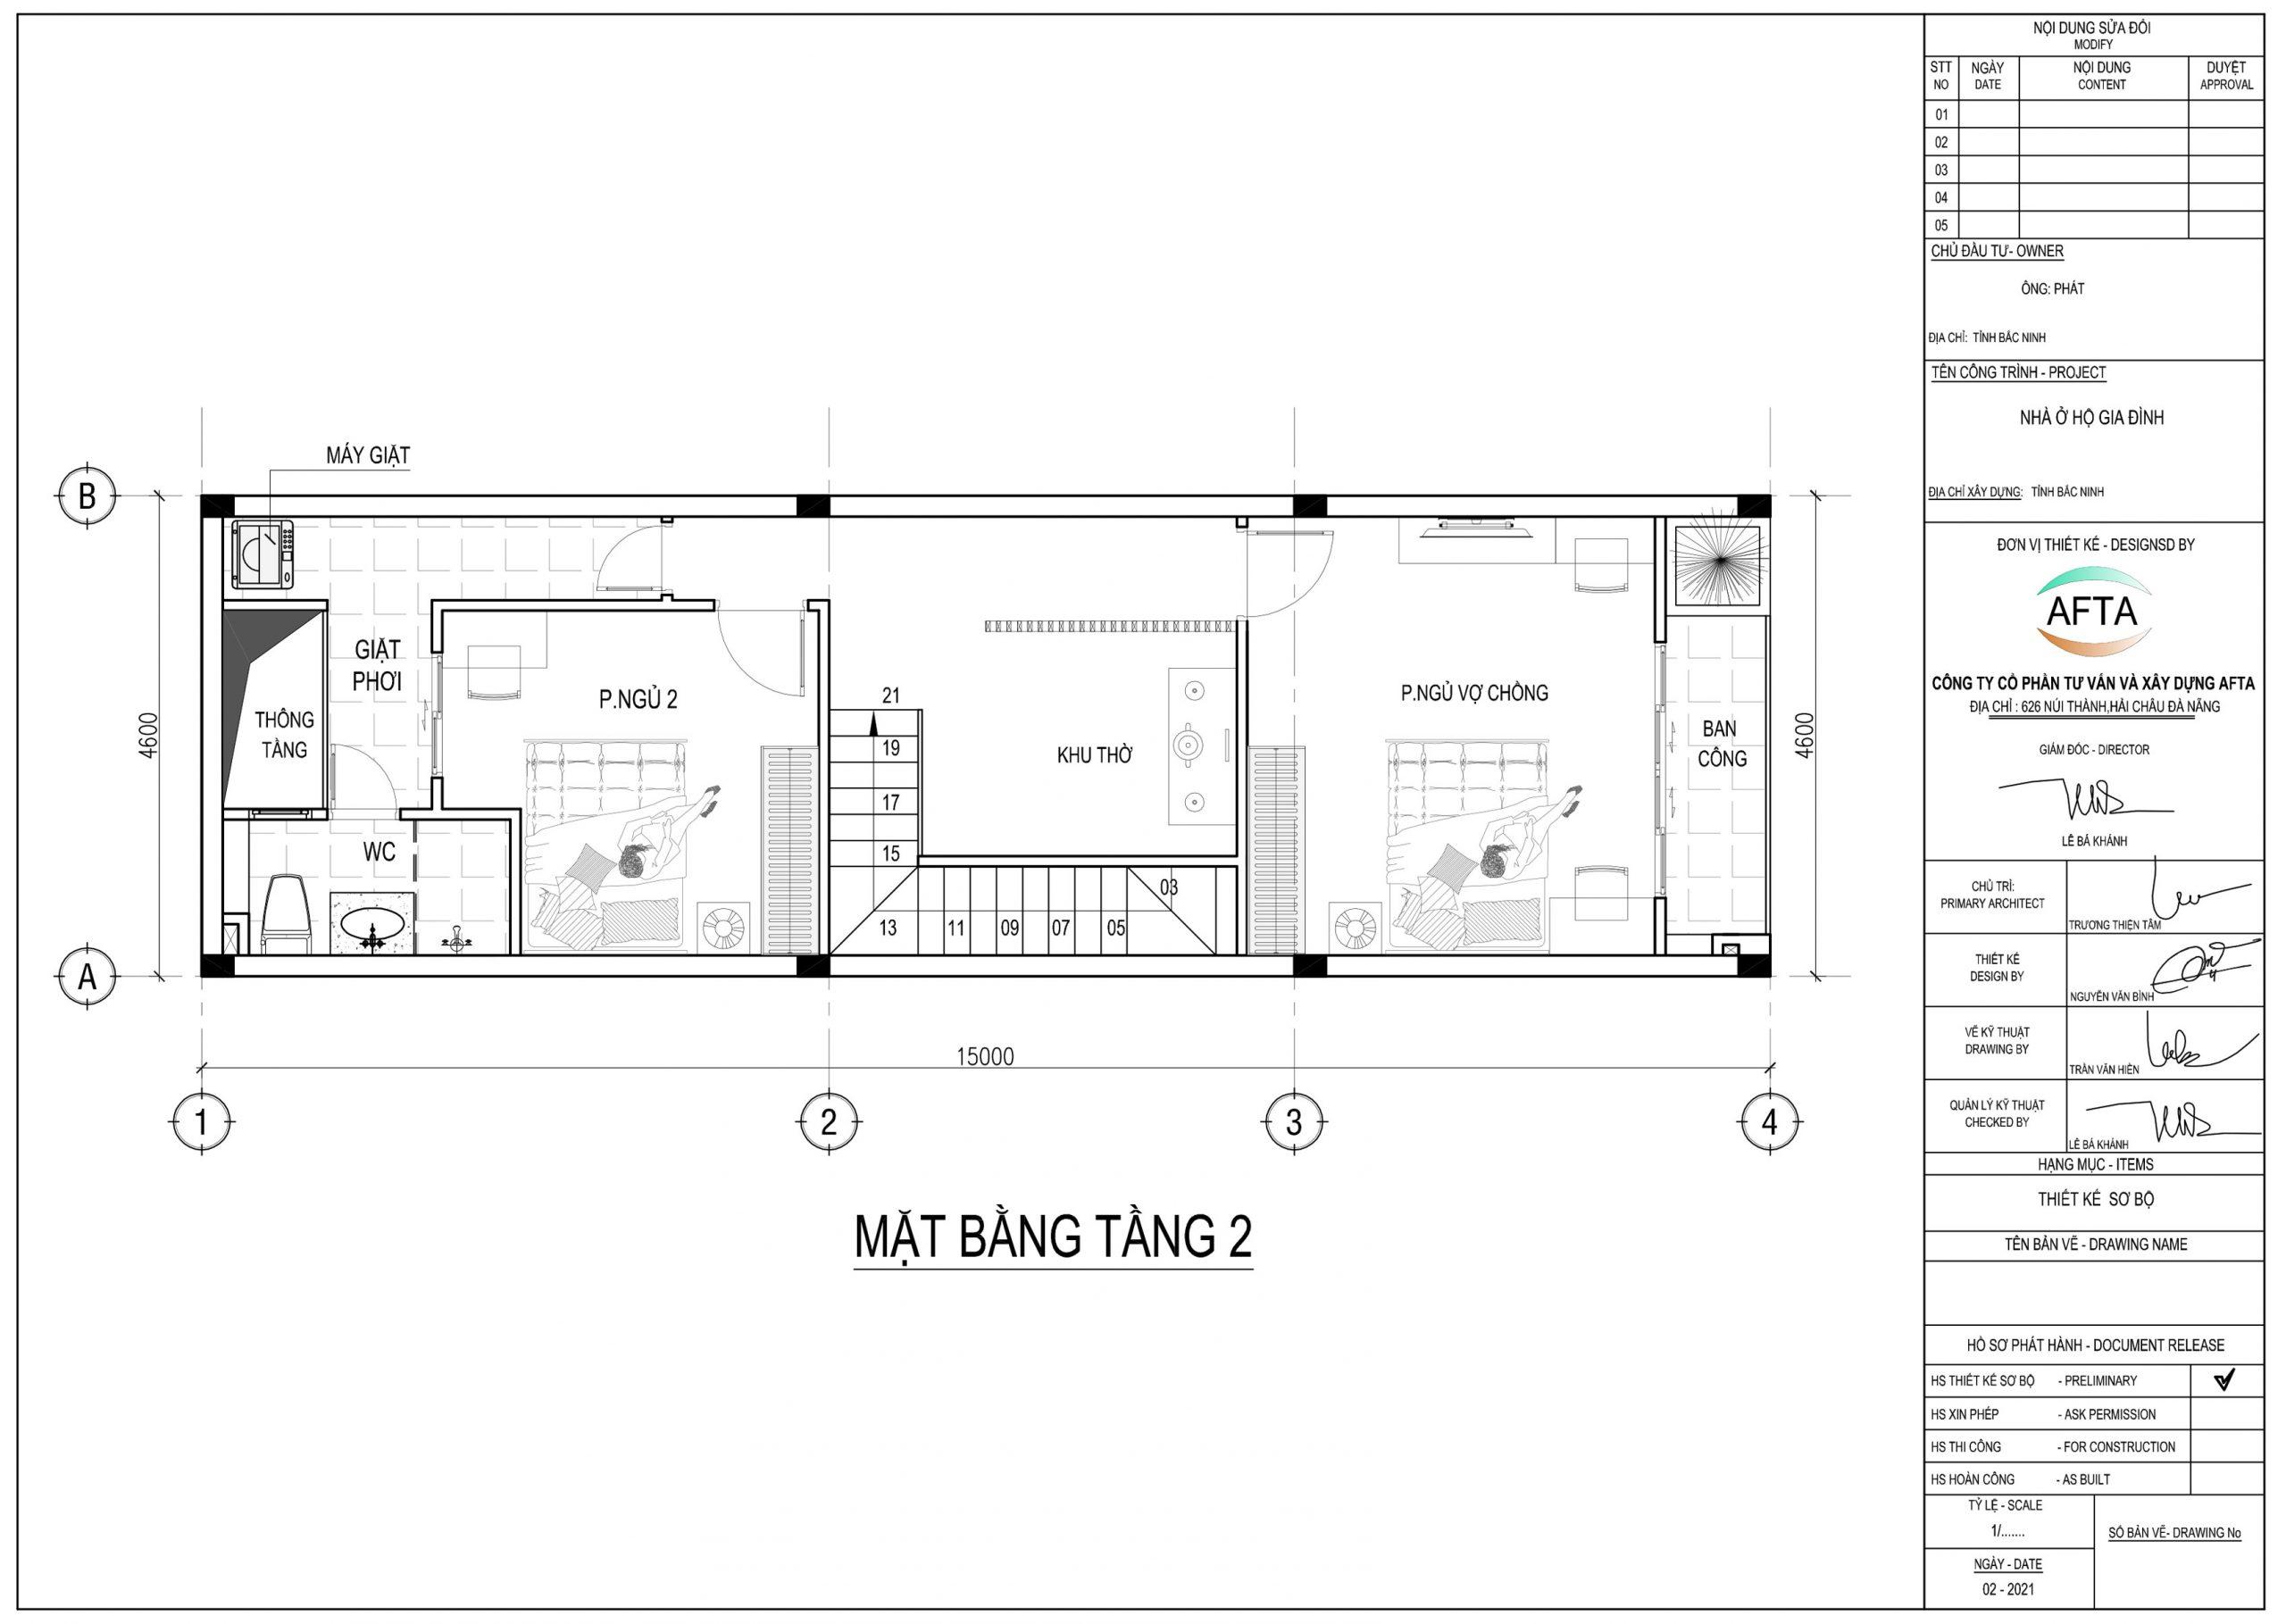 mat-bang-tang-2-nha-dinh-phat-bac-ninh